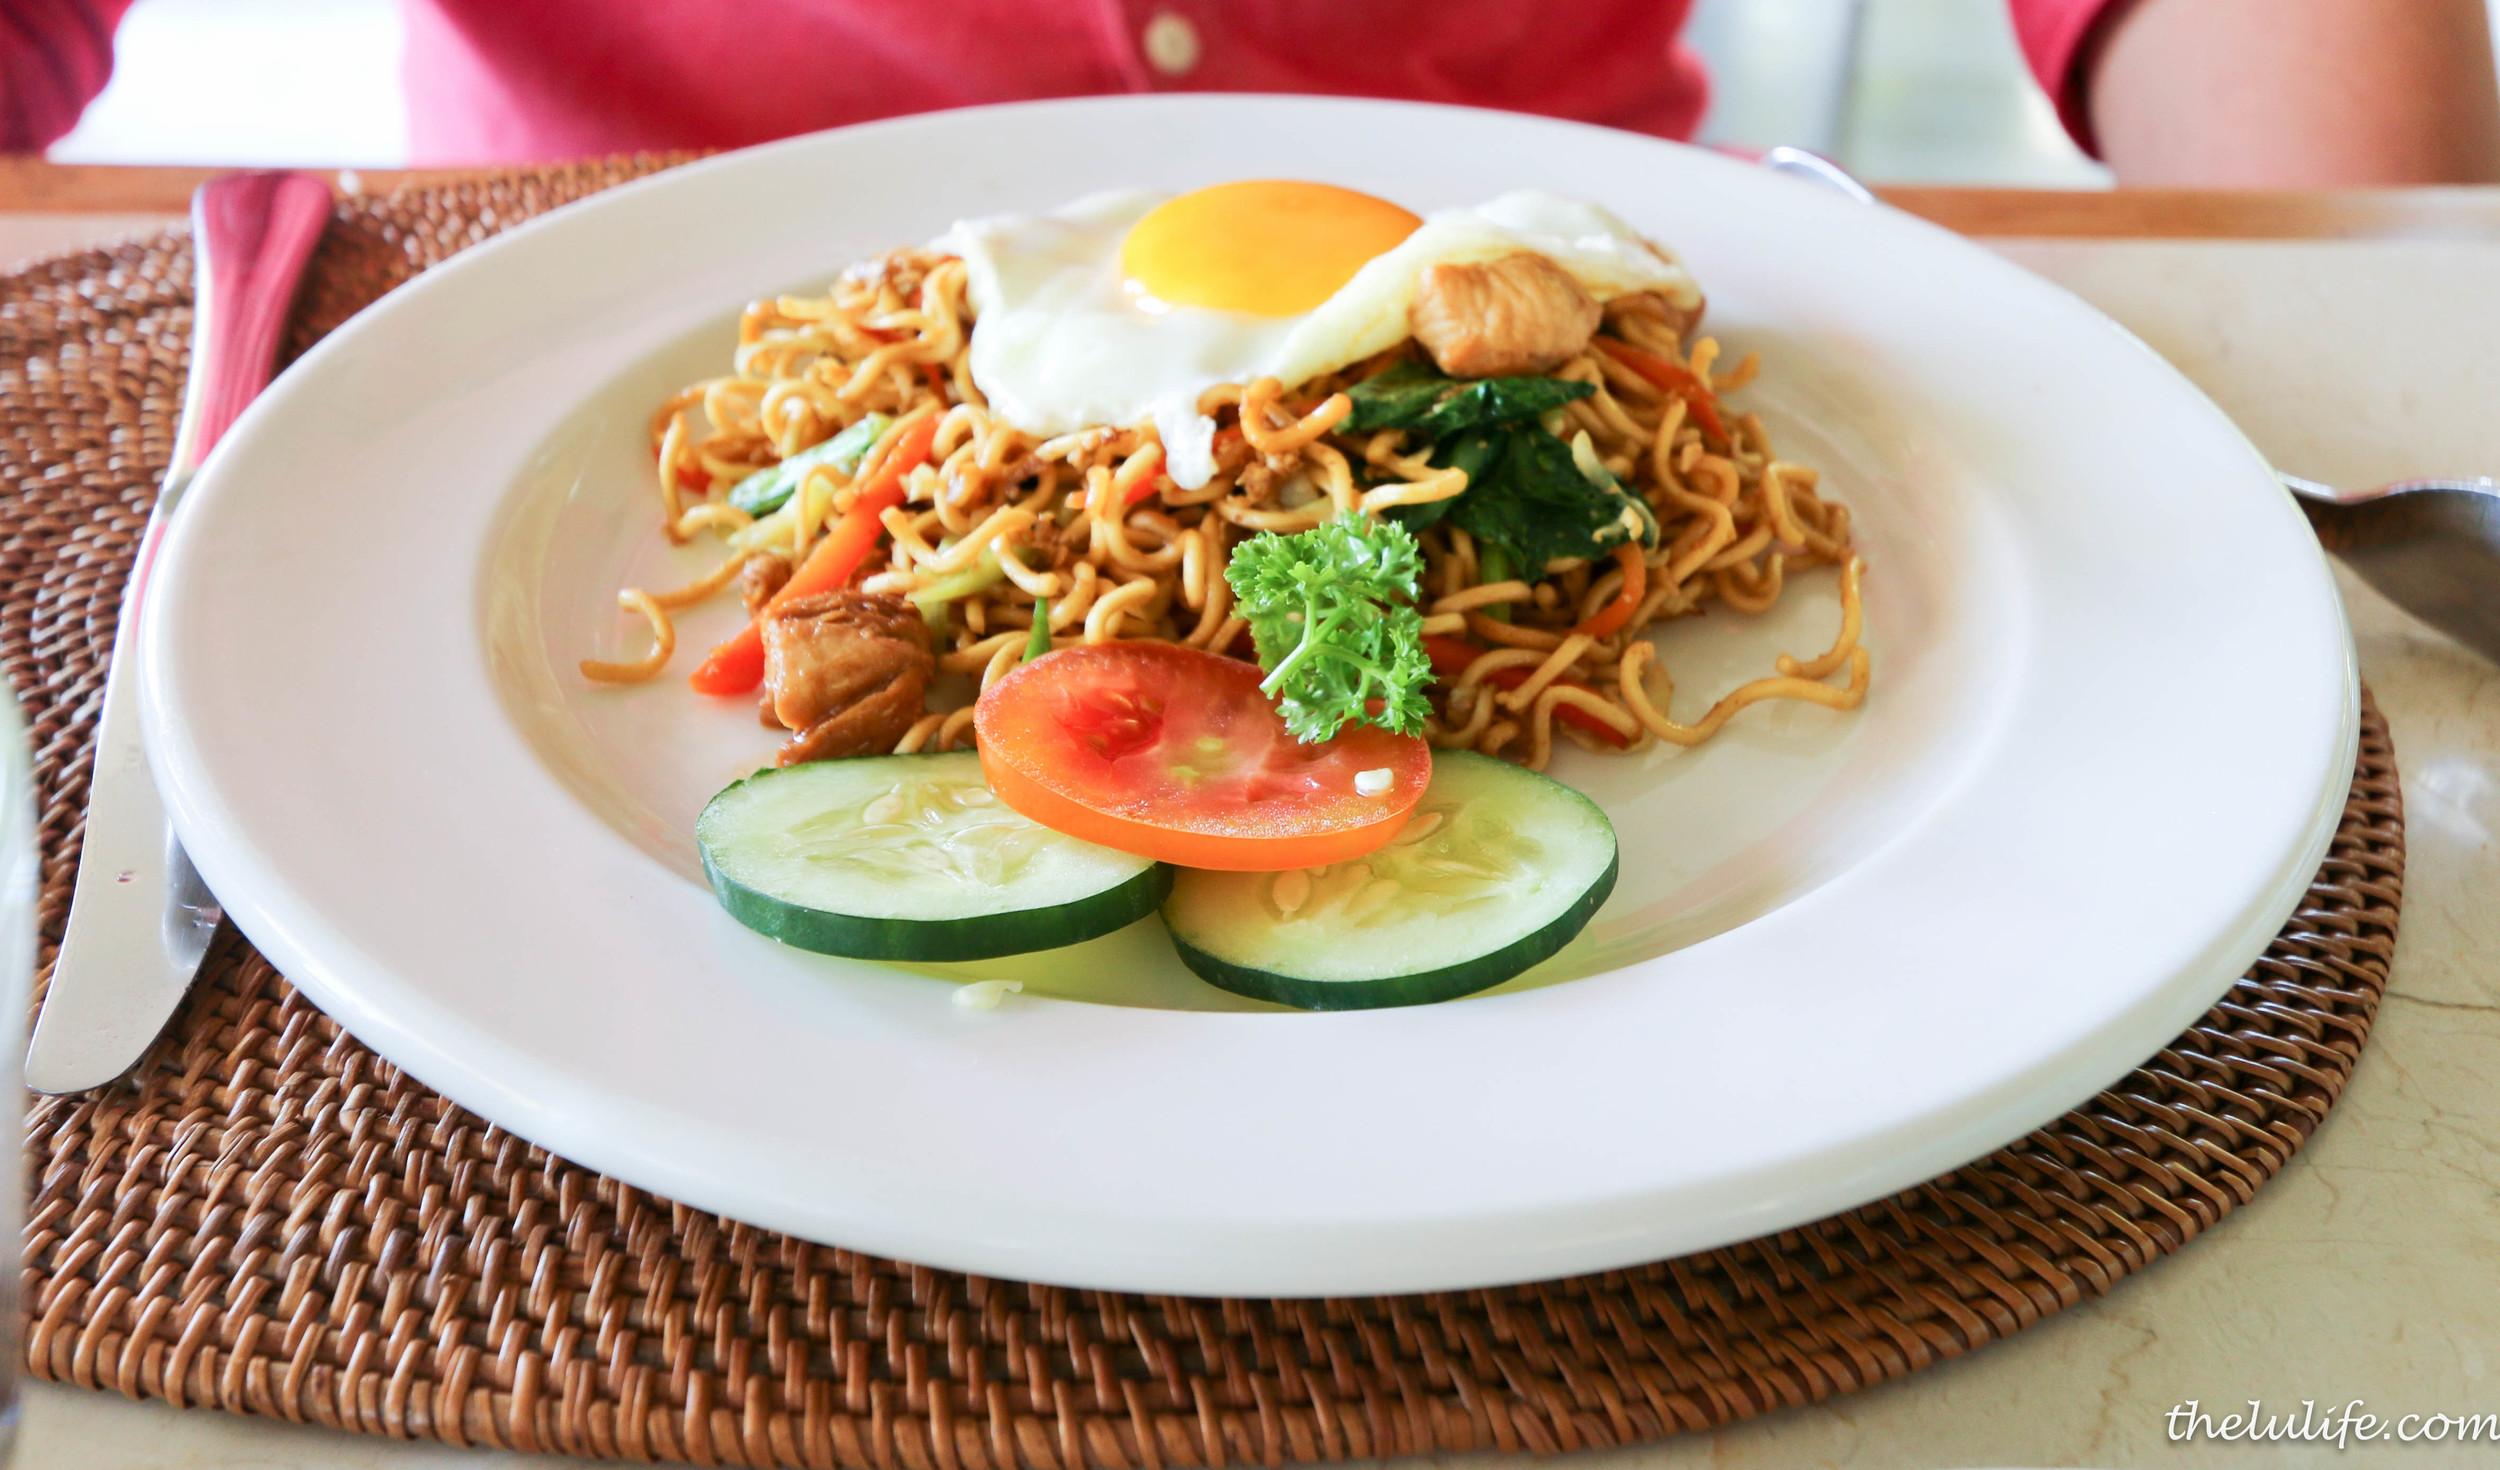 Bakmie goreng ayam - stir fried noodle with chicken, vegetables and fried egg